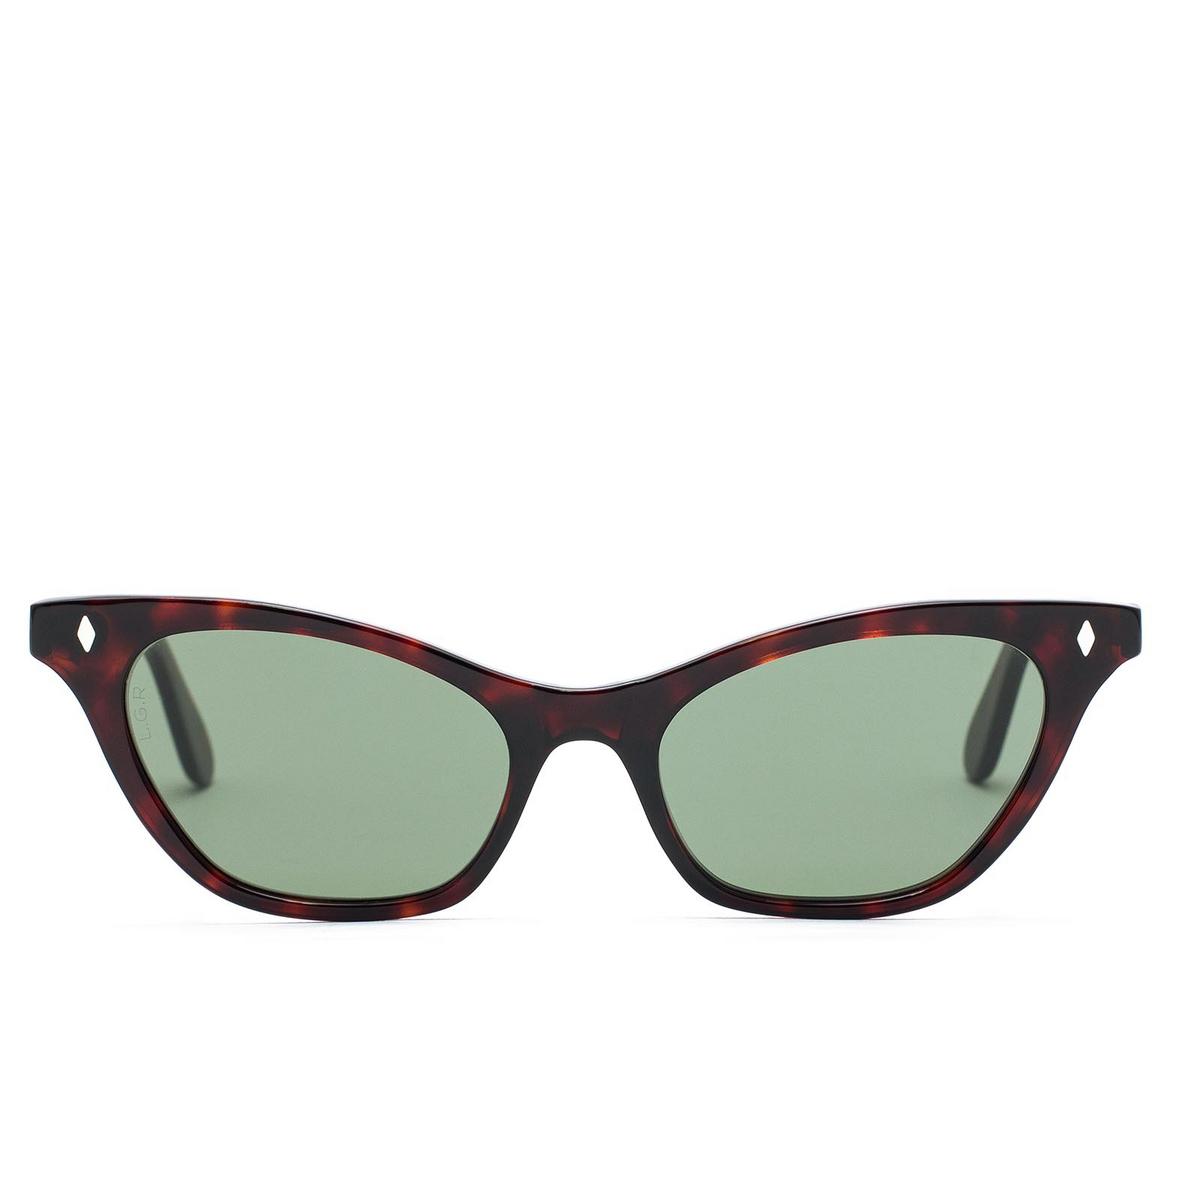 L.G.R® Cat-eye Sunglasses: Kimberly color Havana Bordeaux 65.